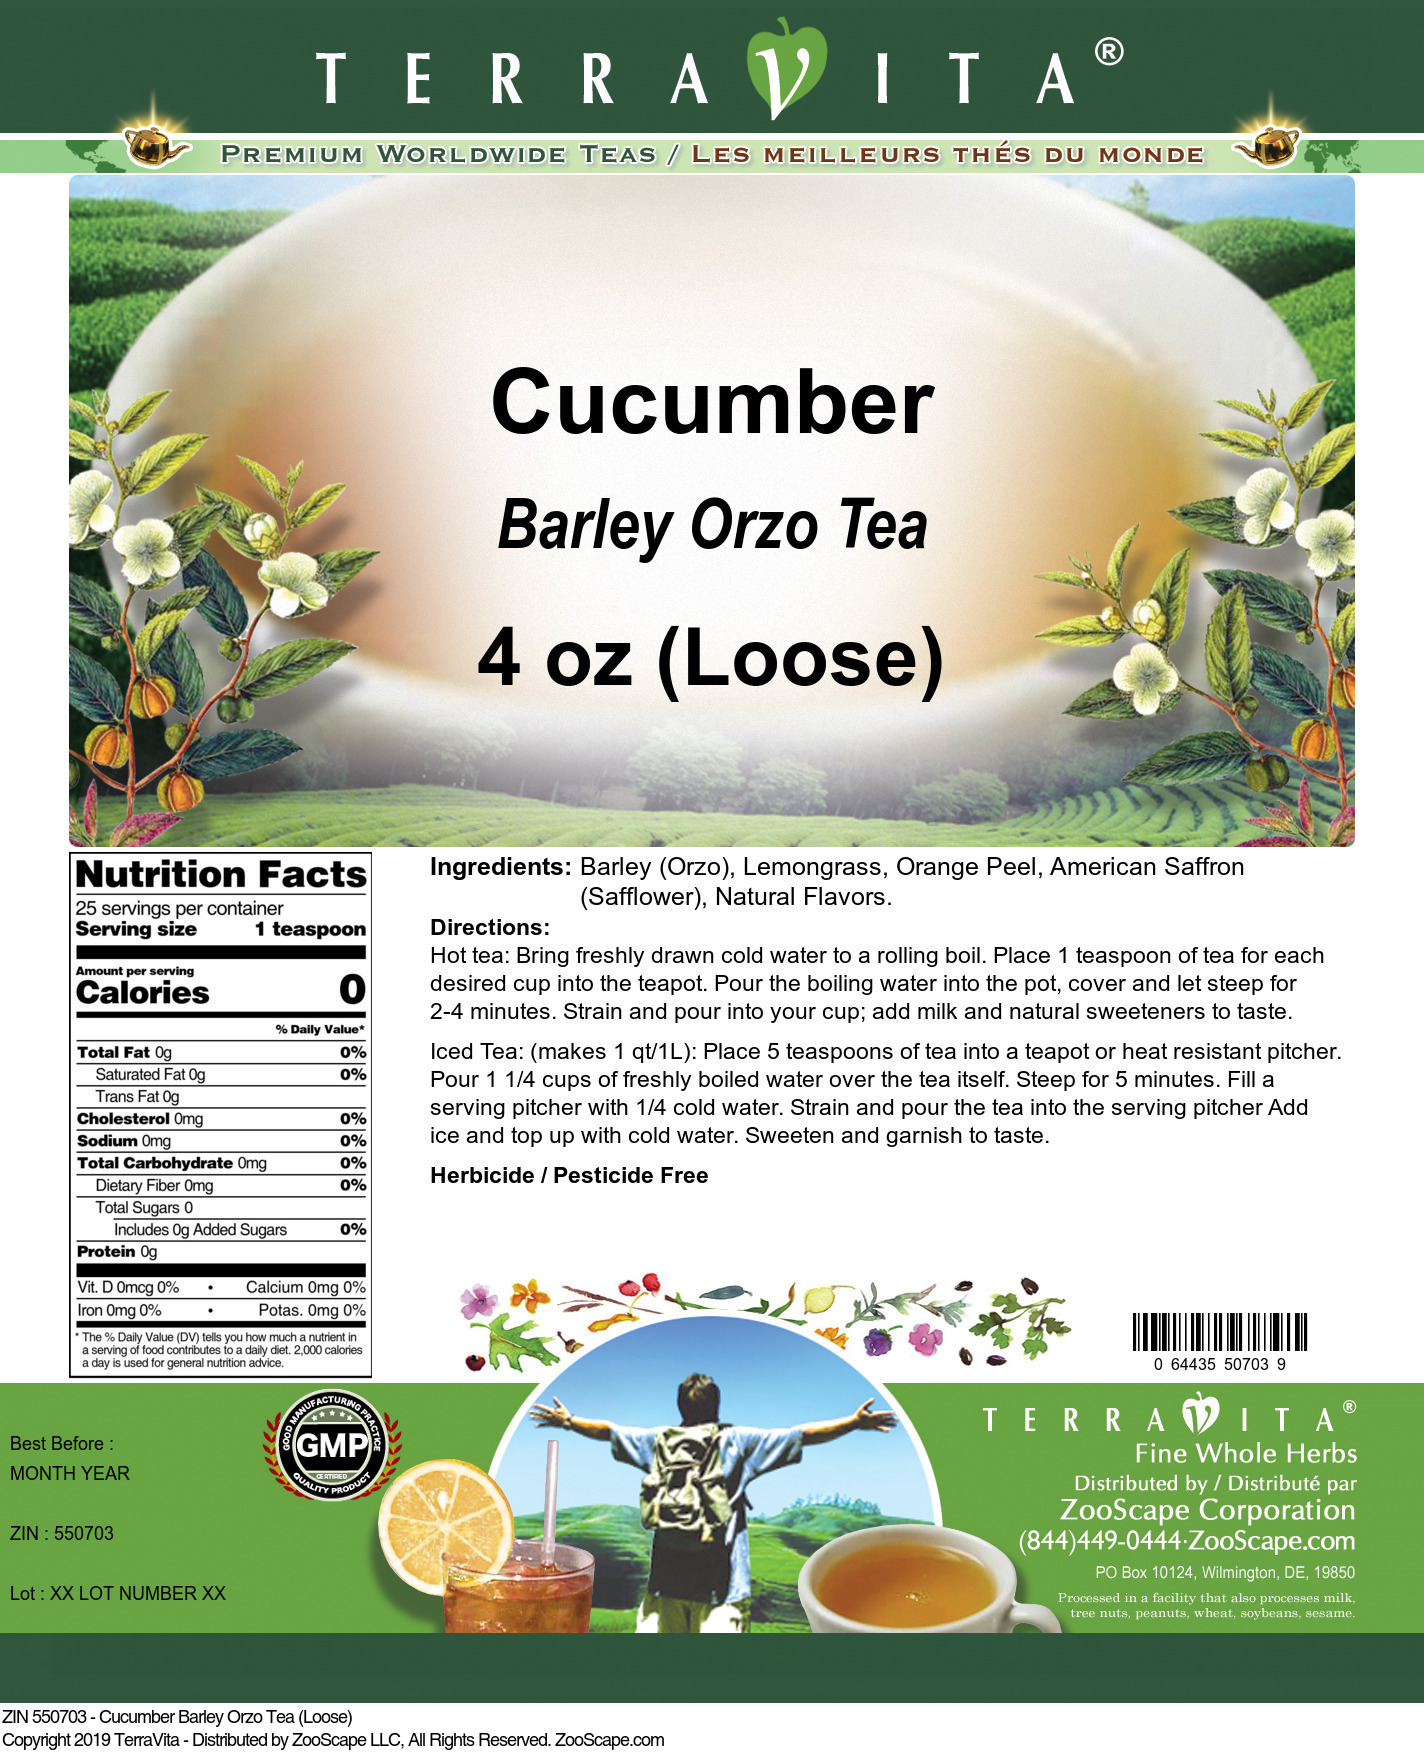 Cucumber Barley Orzo